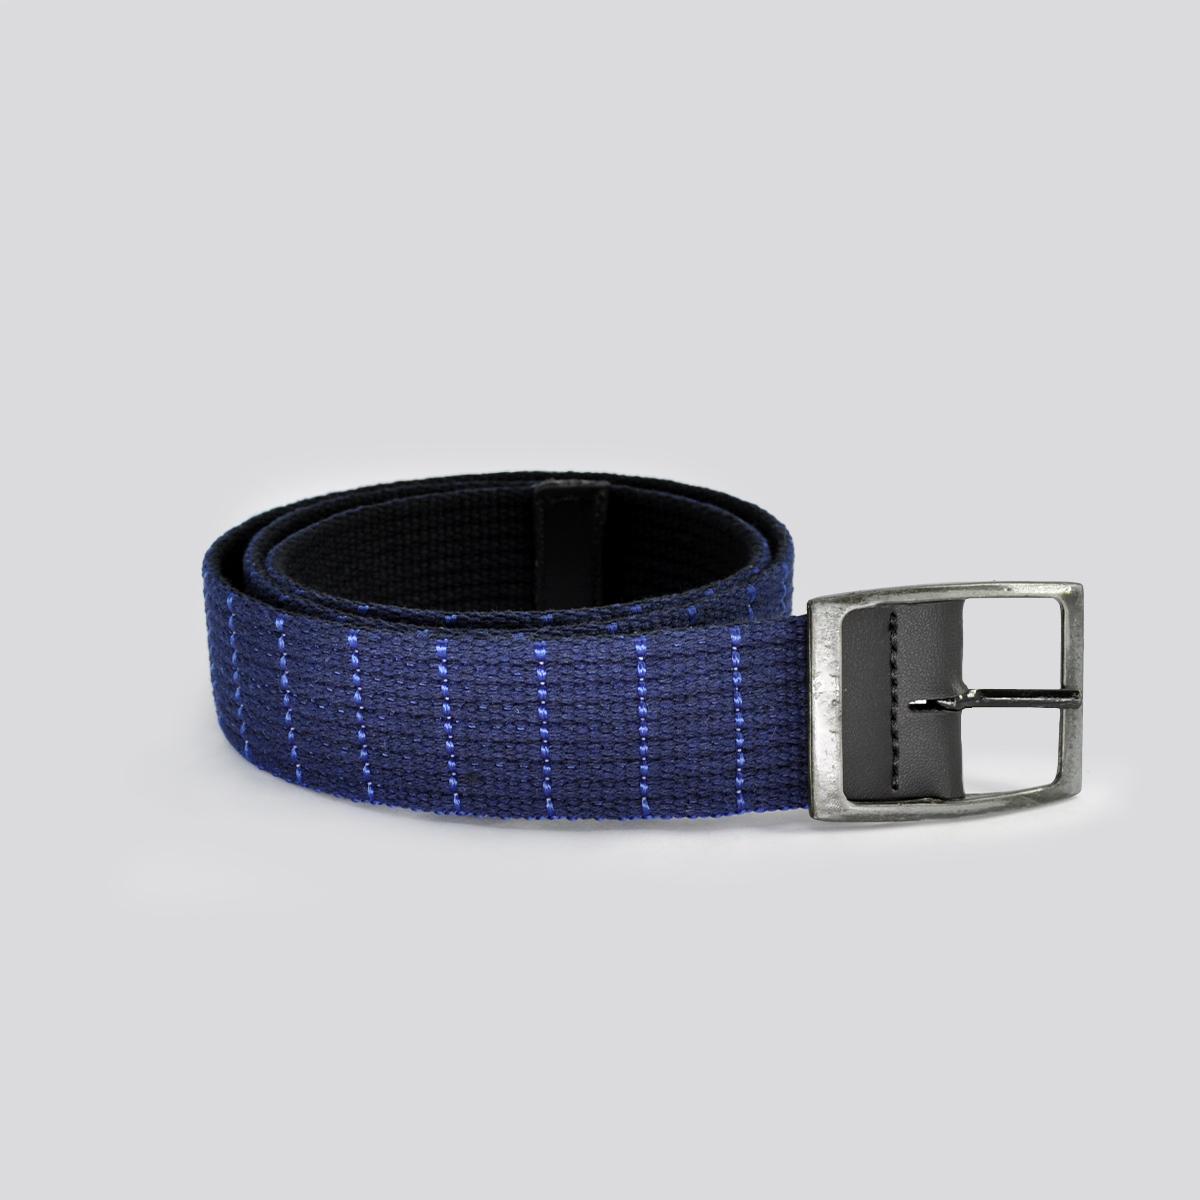 Cinto Casual LF Braska Azul Escovado